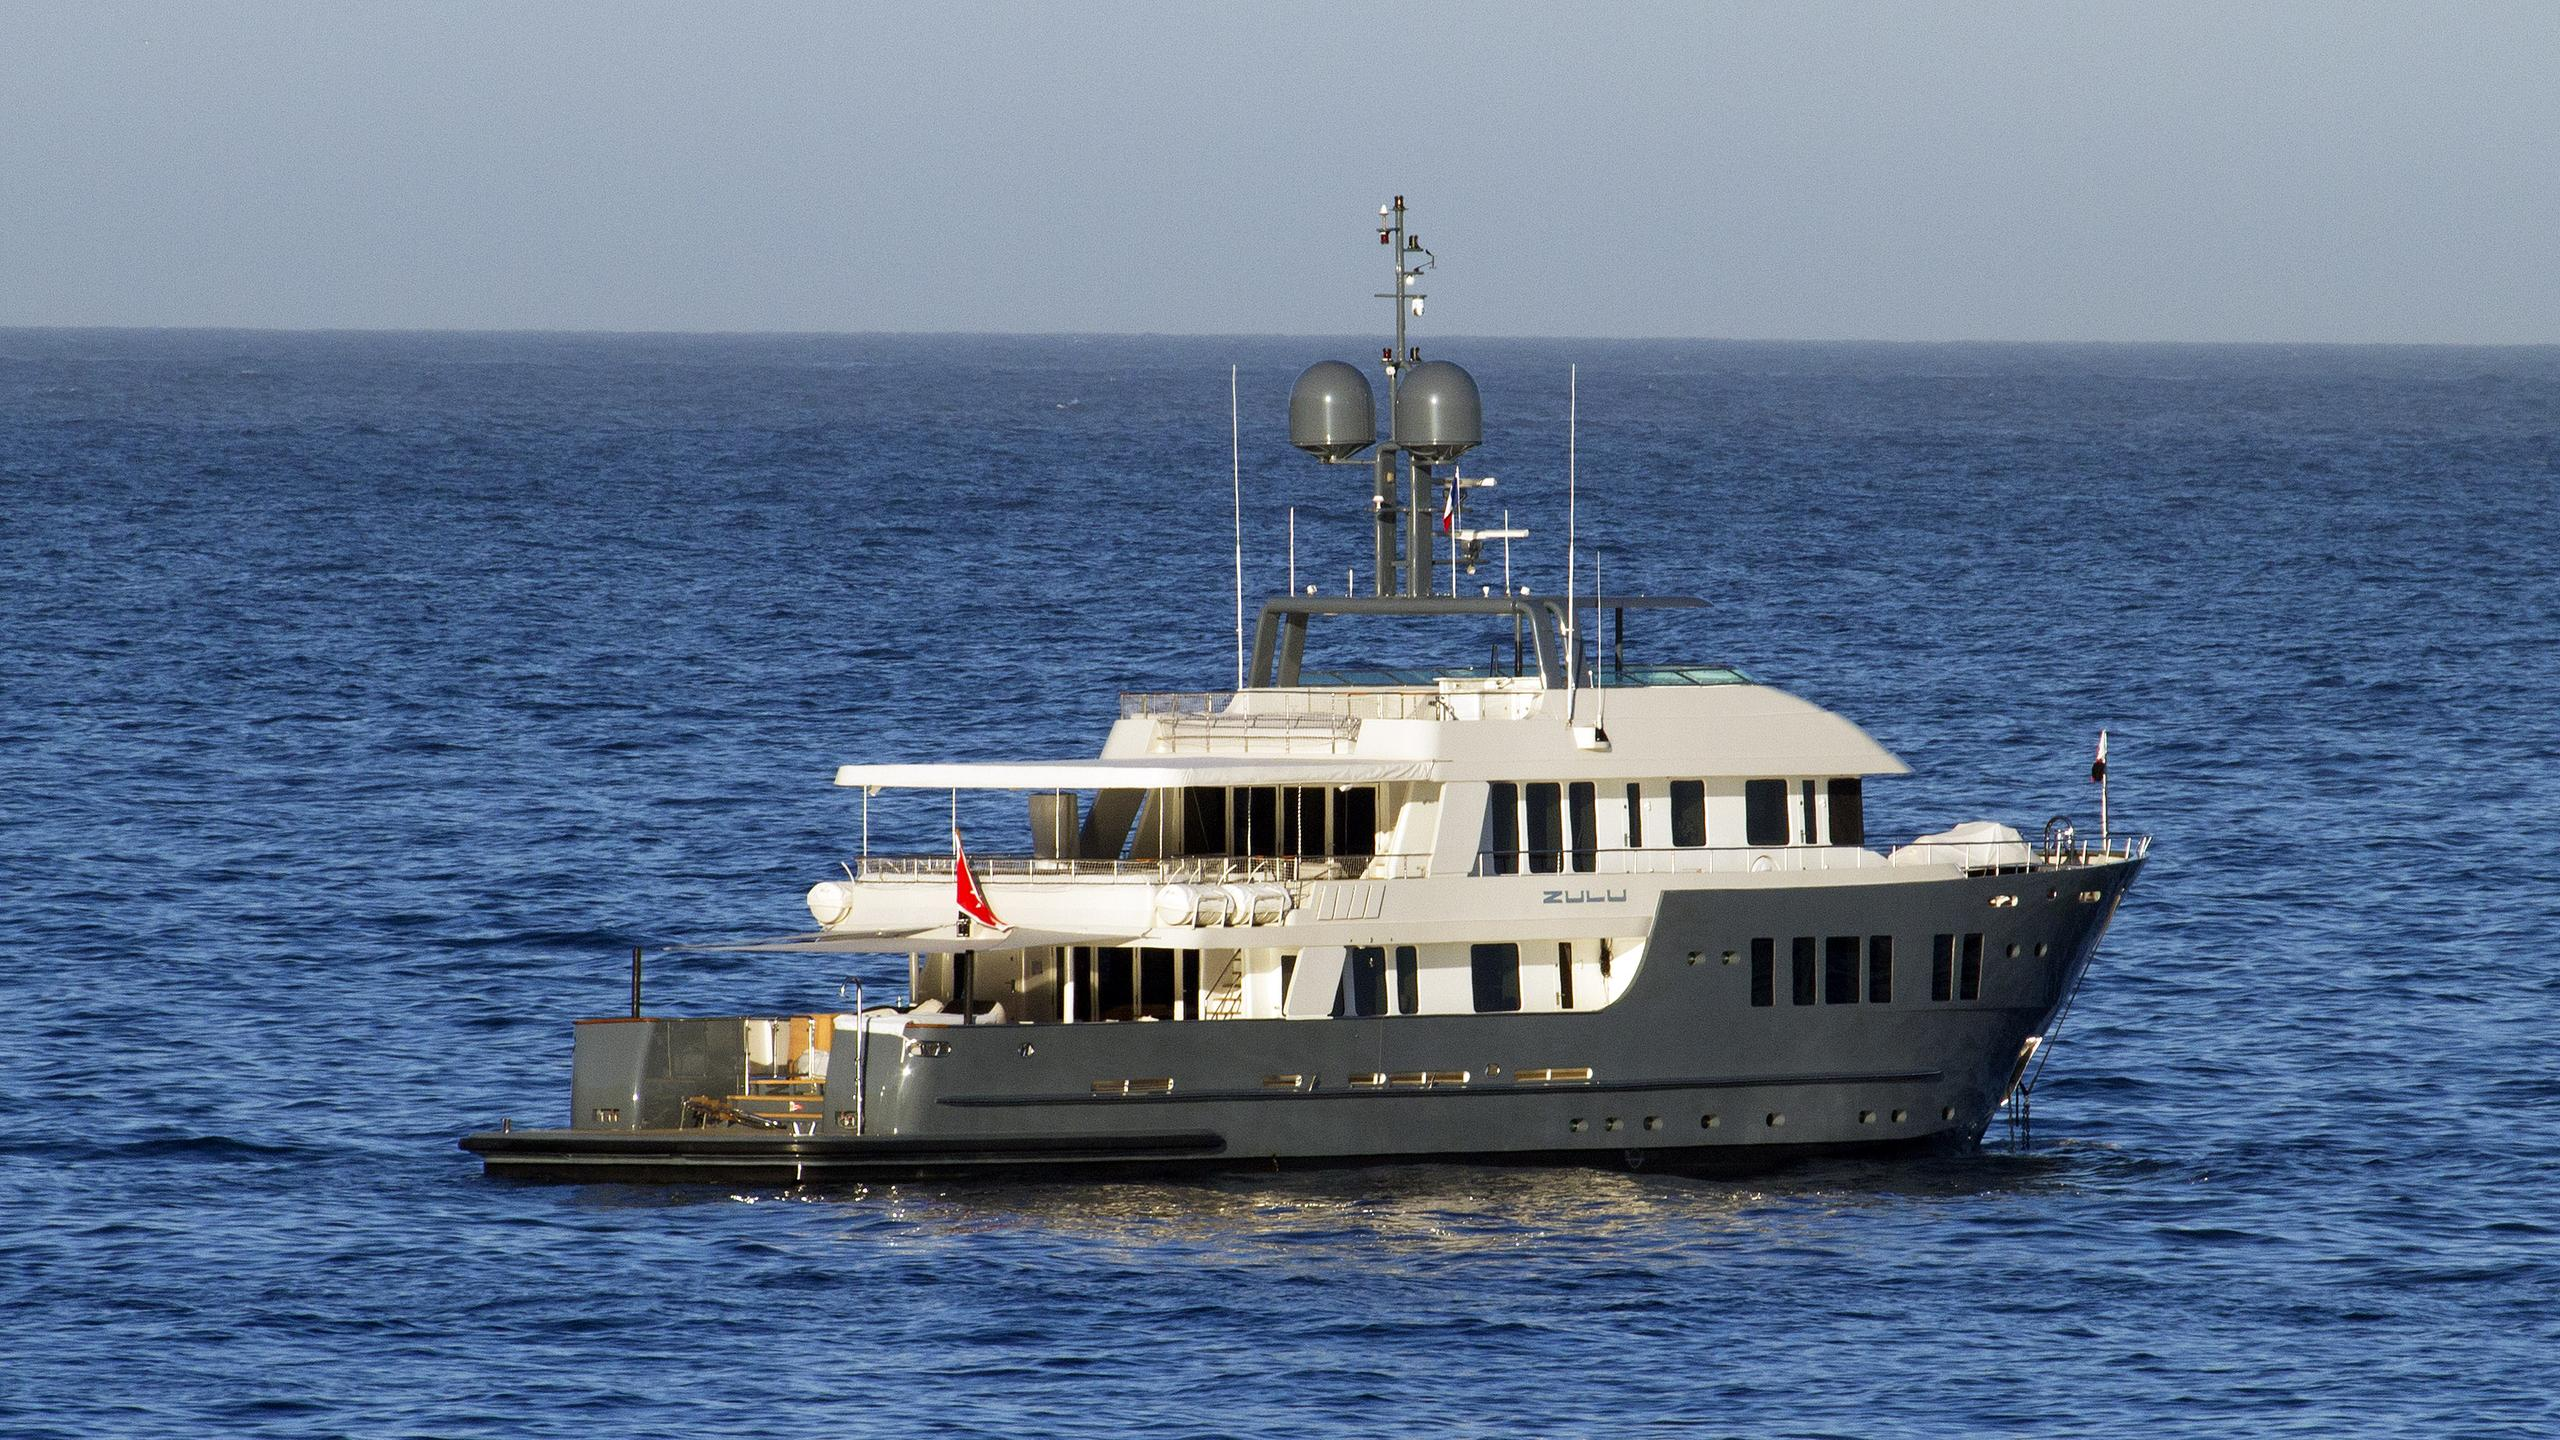 zulu-motor-expedition-yacht-inace-explorer-100-2009-35m-half-stern